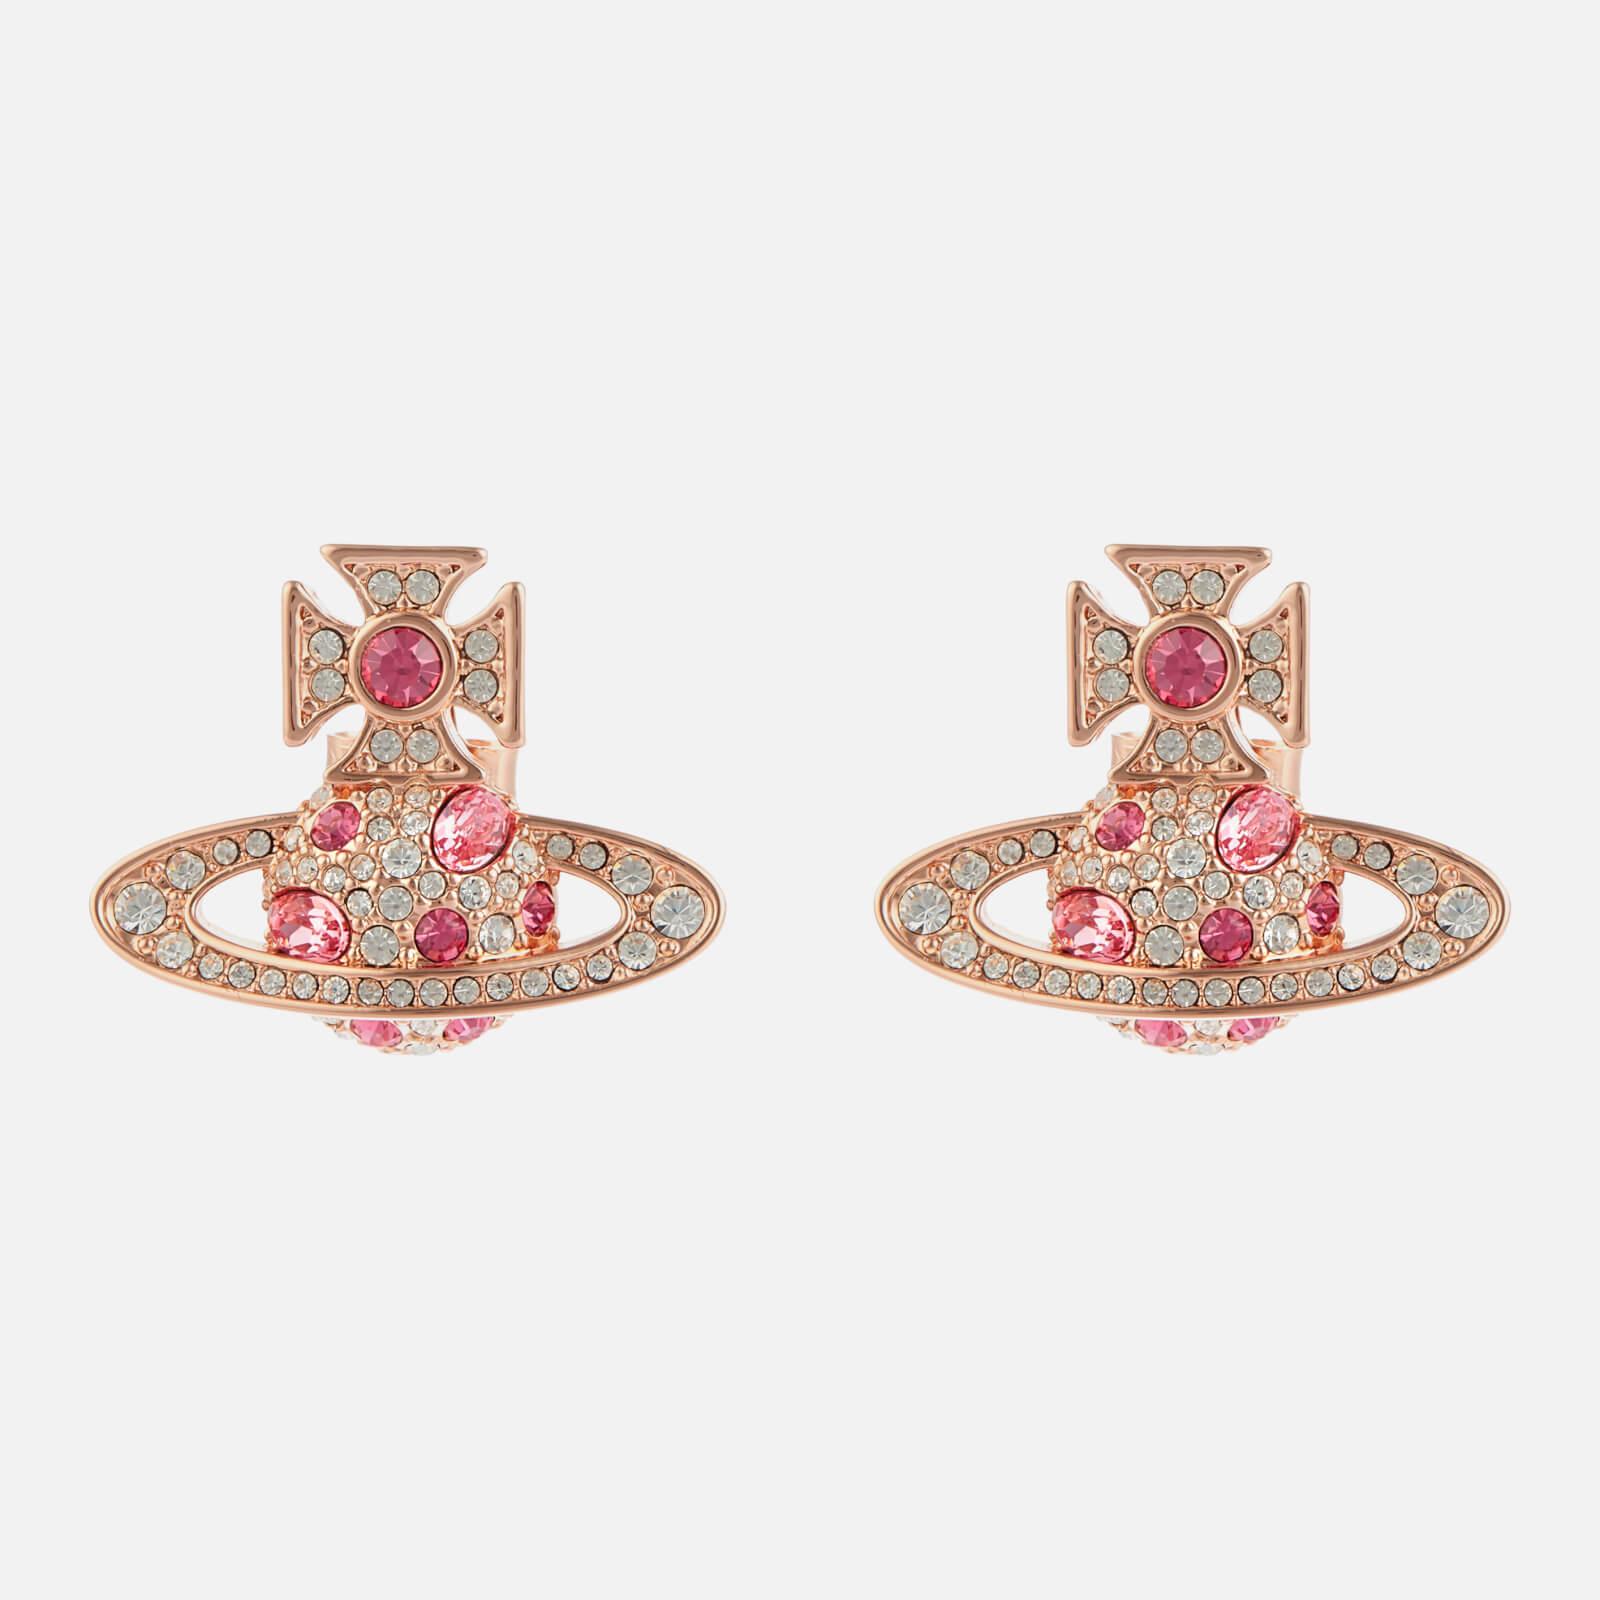 Vivienne Westwood Women's Francette Bas Relief Earrings - Pink Gold/Rose